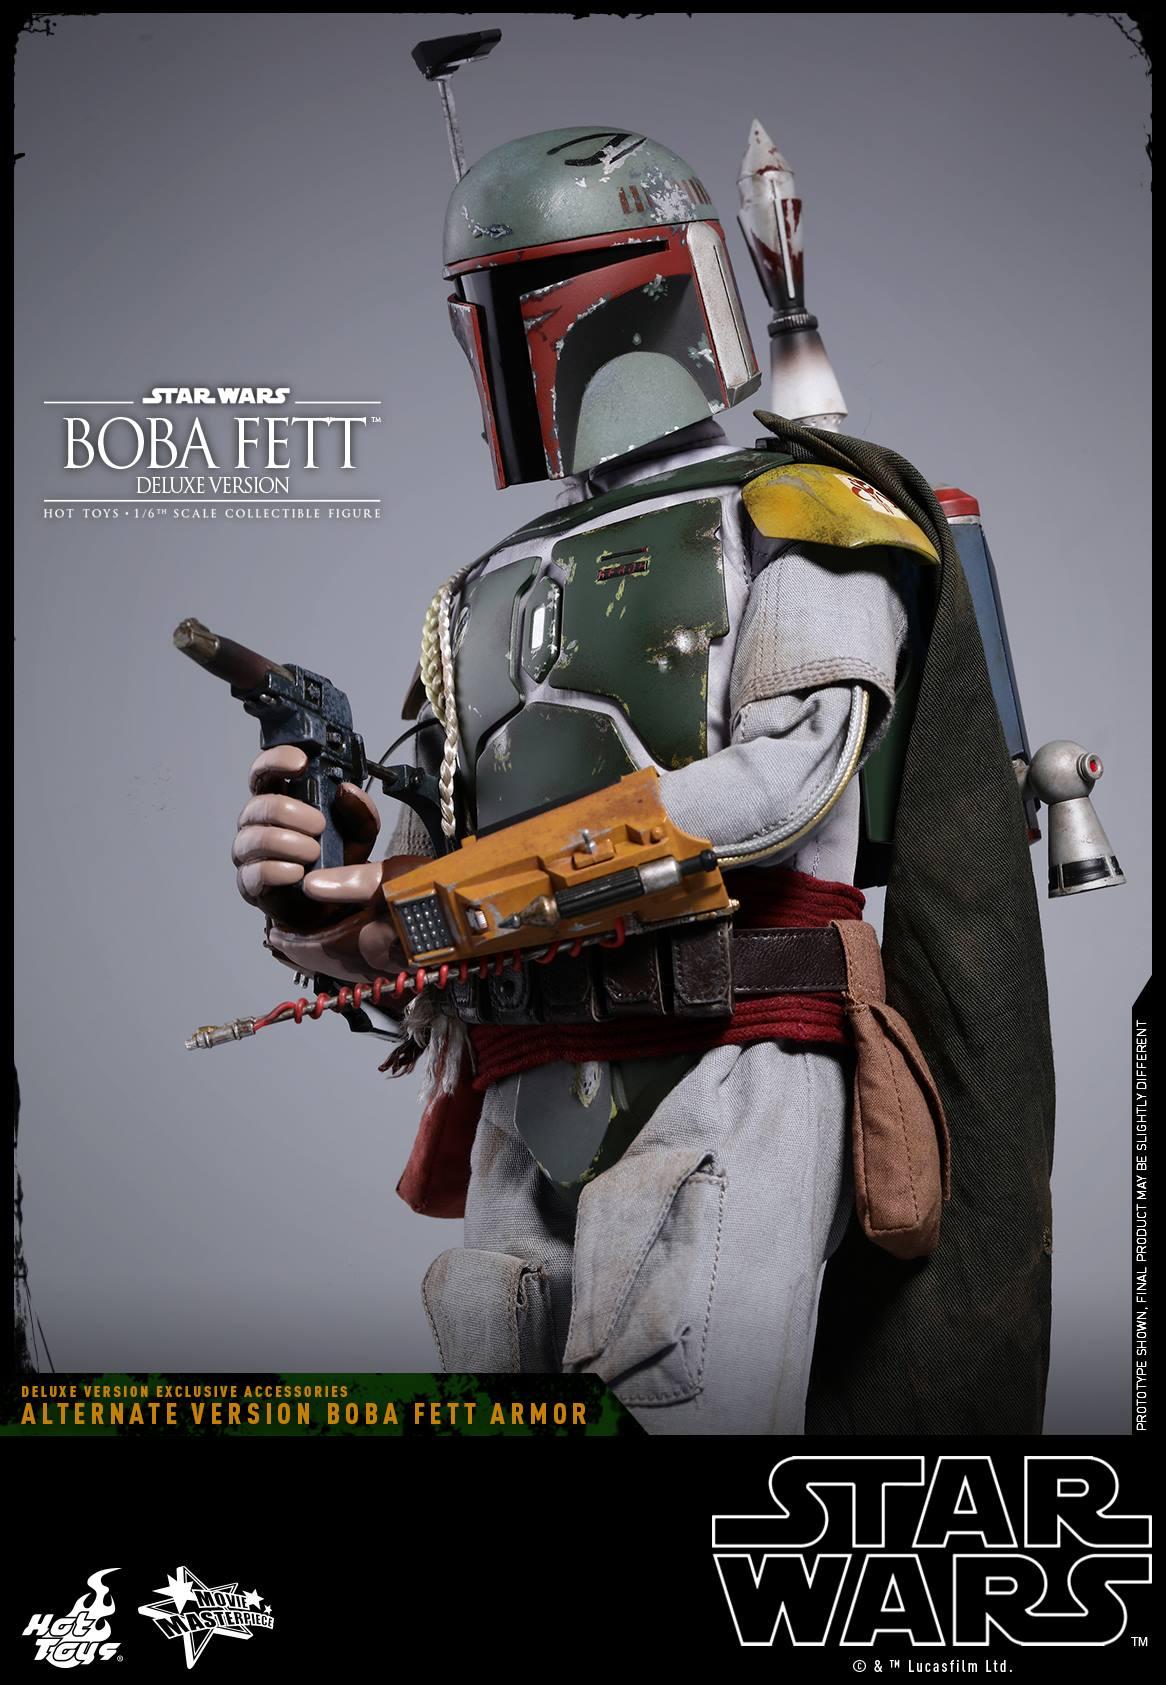 Hot Toys Boba Fett From Star Wars The Empire Strikes Back